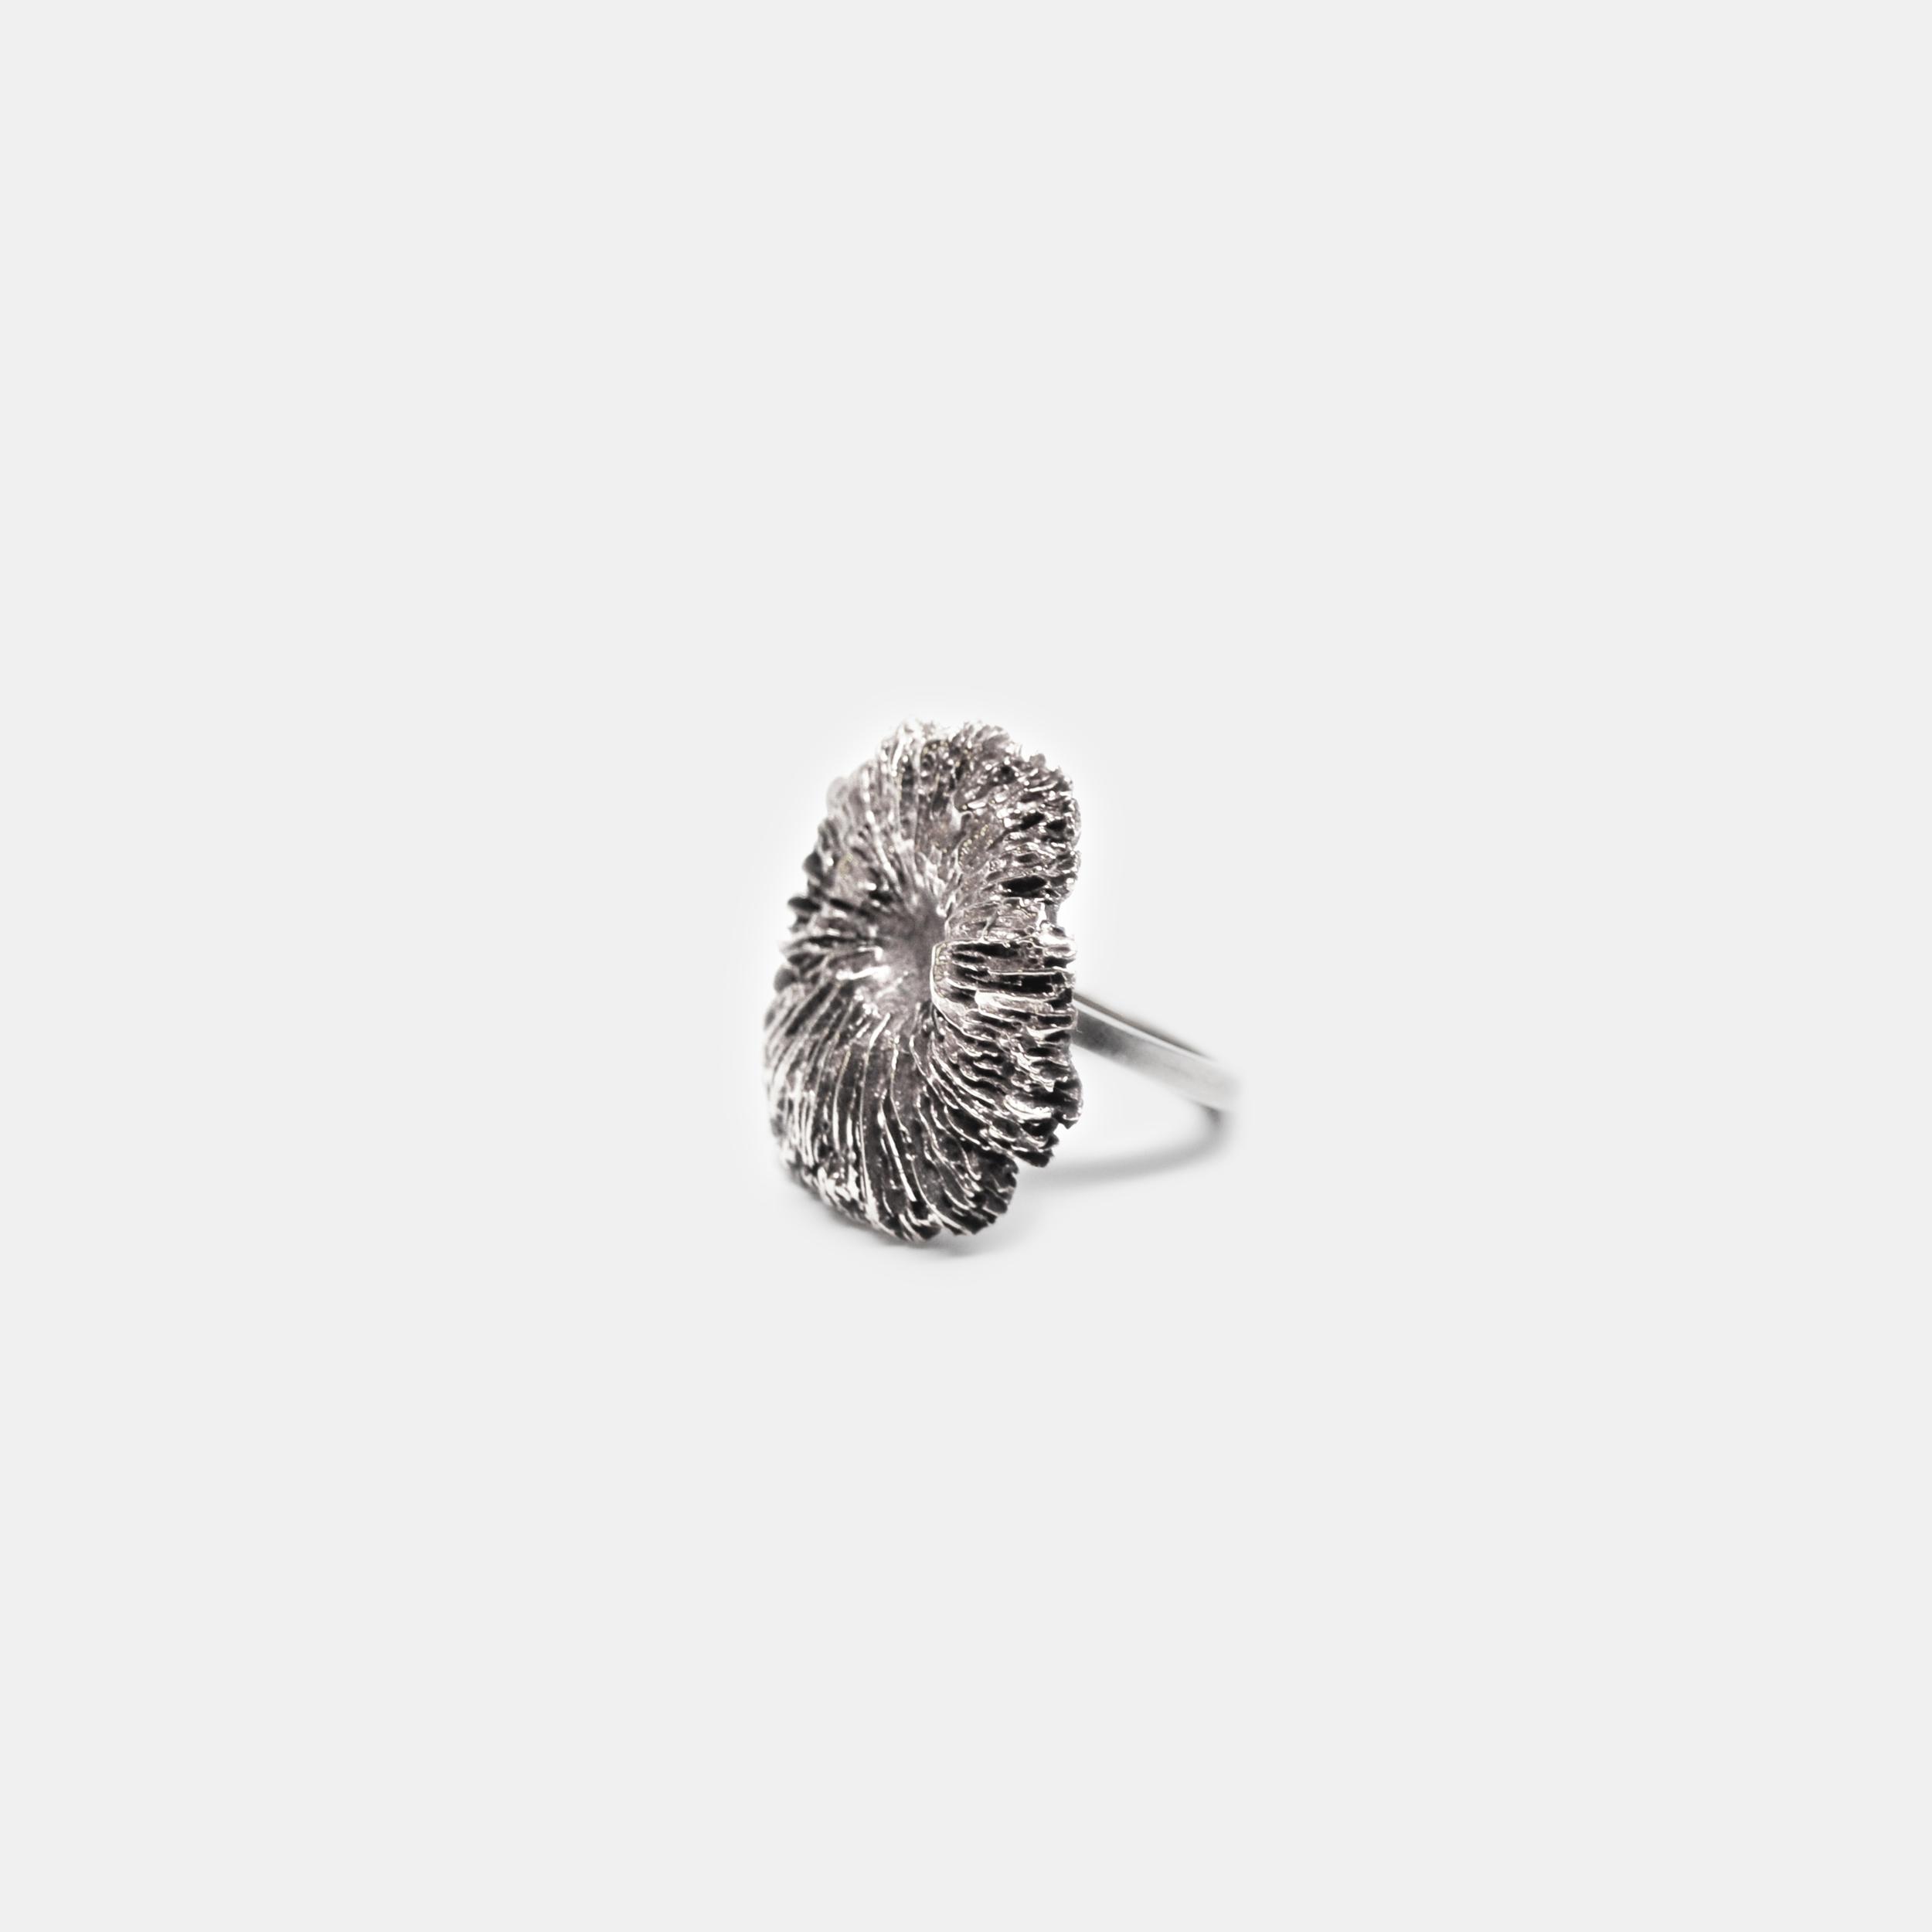 Marisa_Lomonaco_Hudson_Valley_custom_Jewelry_0005_Silver_Coral_Ring.jpg